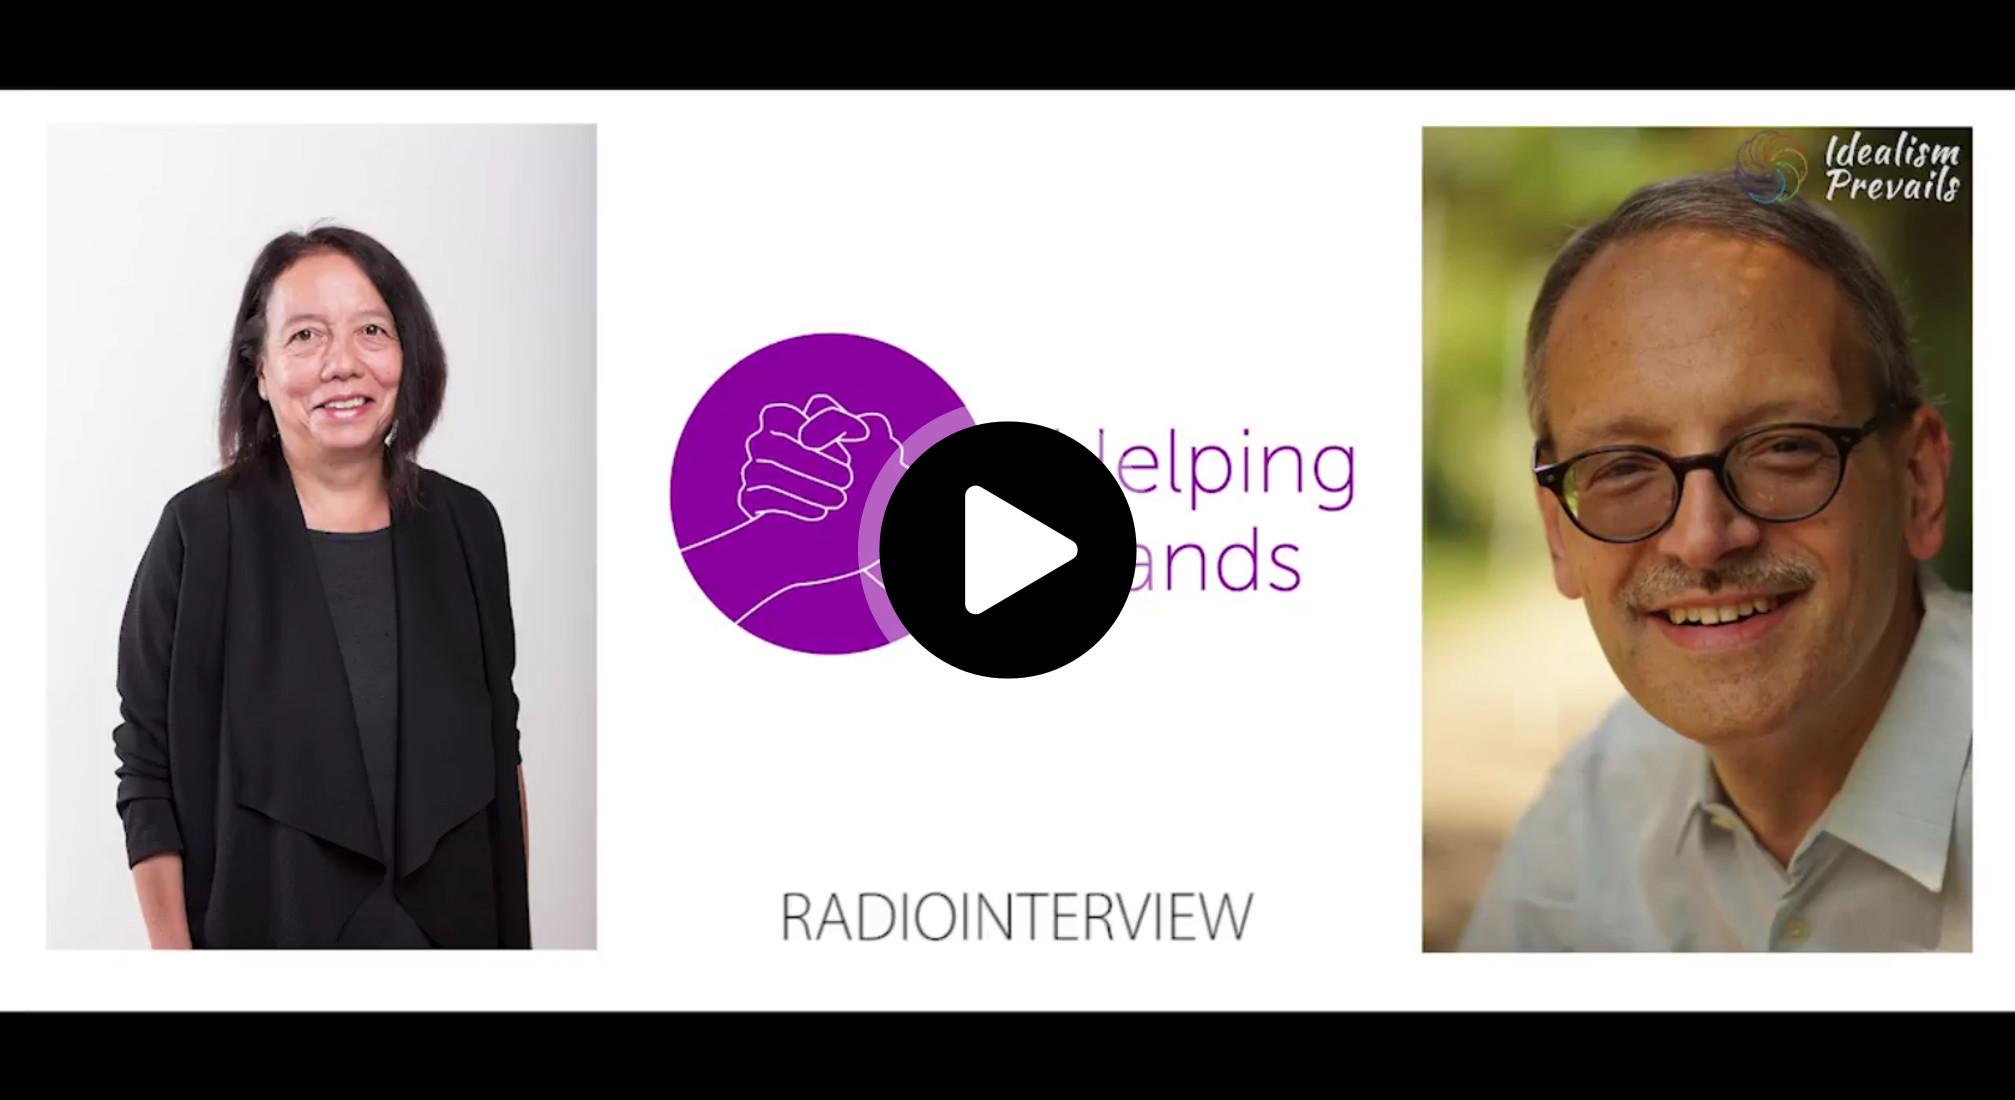 Videobild - Helping Hands